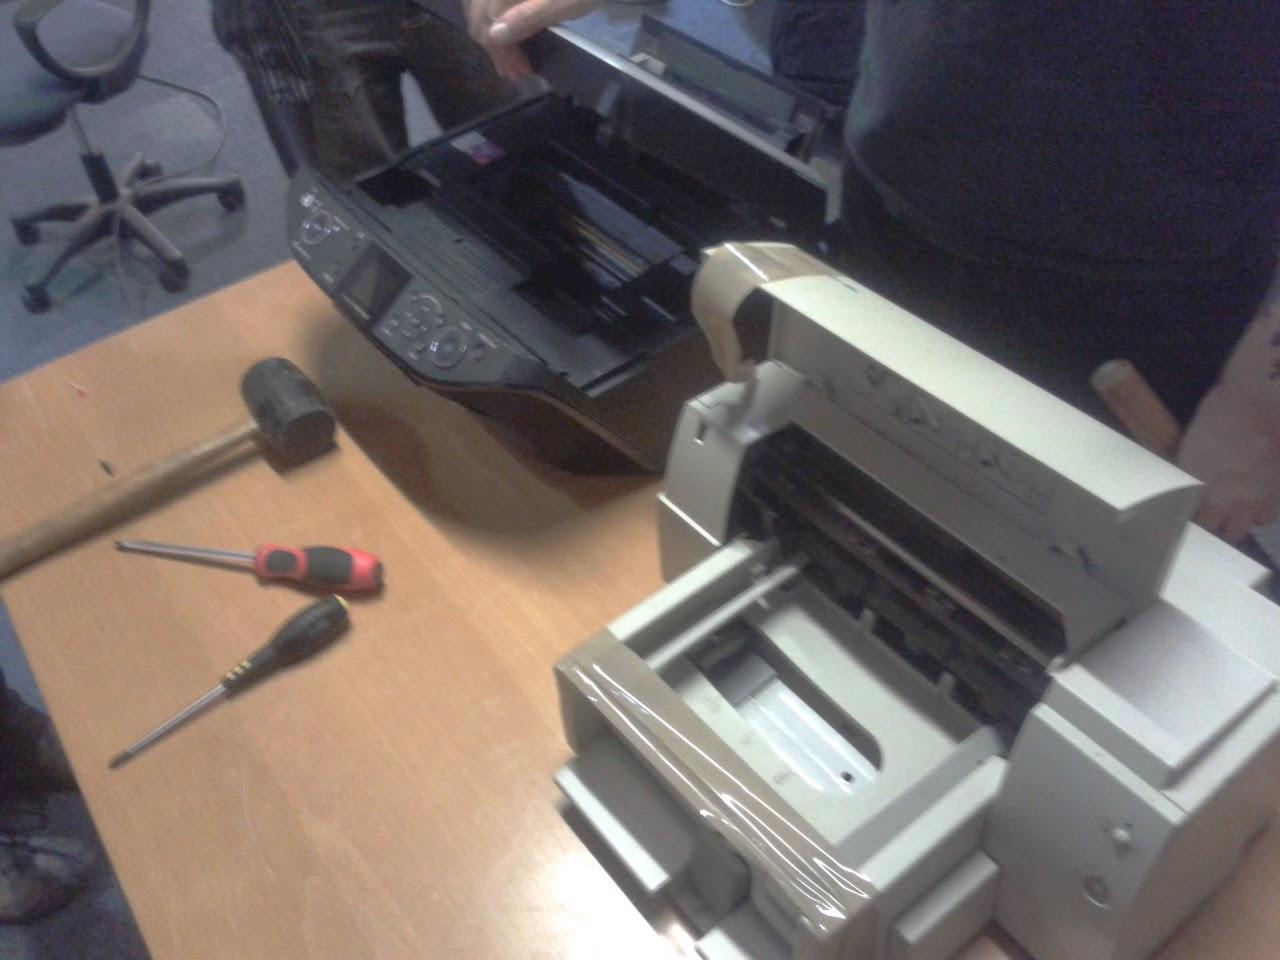 Nerd Club Inkjet Printer Teardown Get At Those Stepper